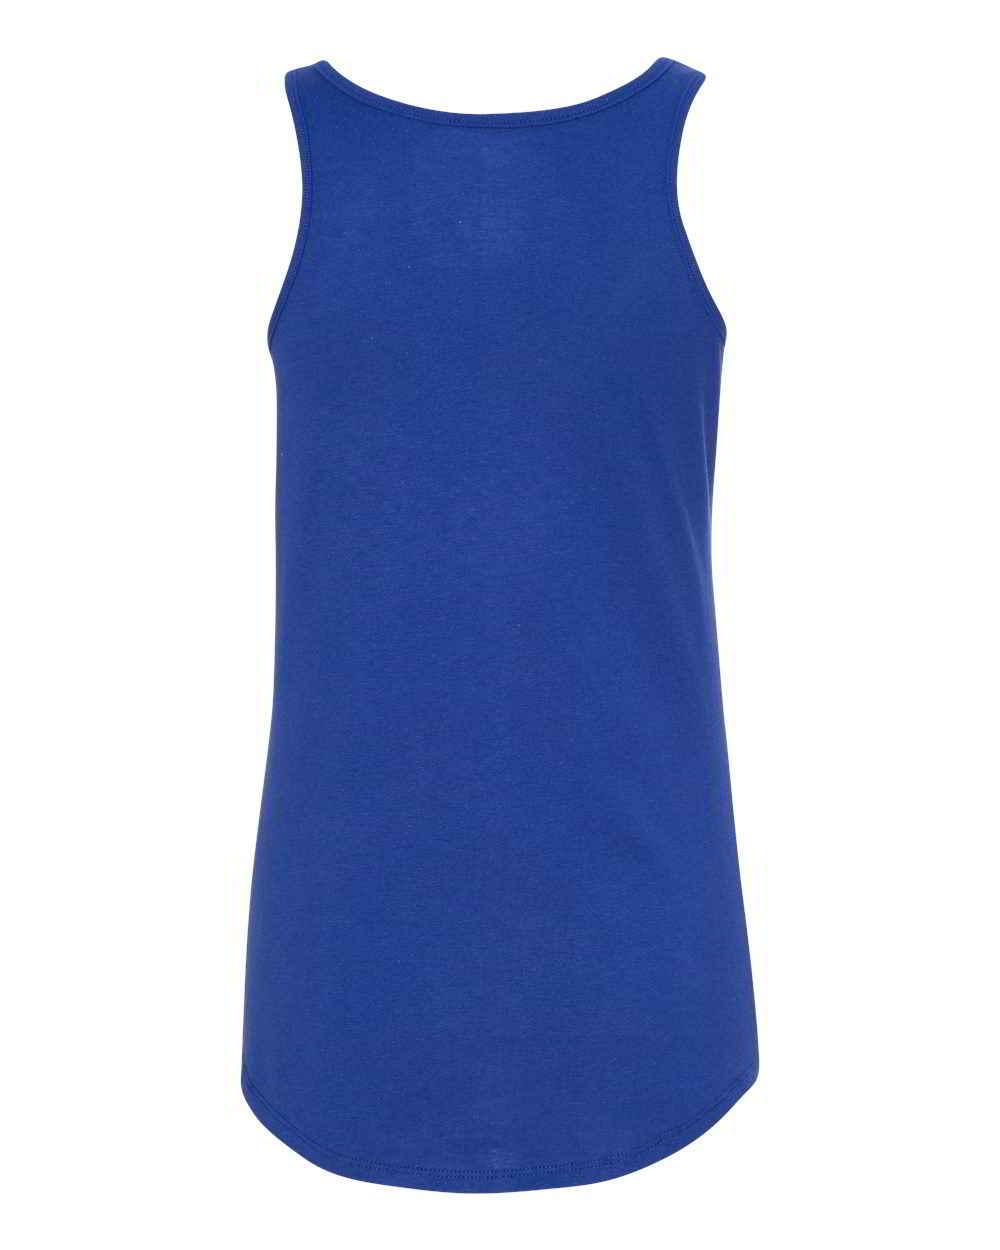 Hanes-Ladies-Moisture-Wicking-Shirts-Sleeveless-X-Temp-Women-039-s-Tank-Top thumbnail 10